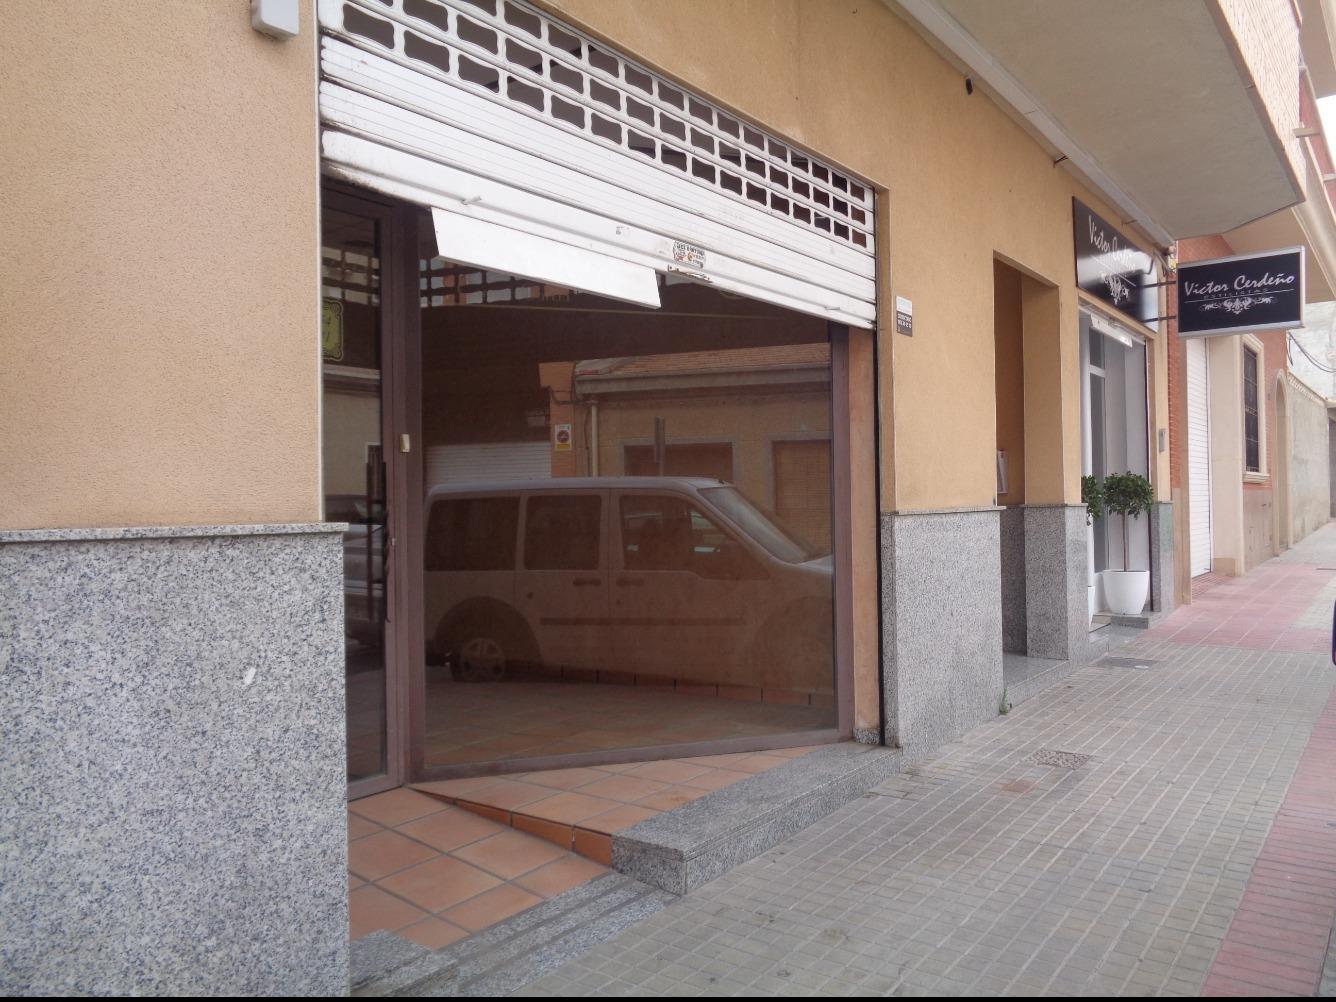 Local en Calle Virgen de las Mercedes